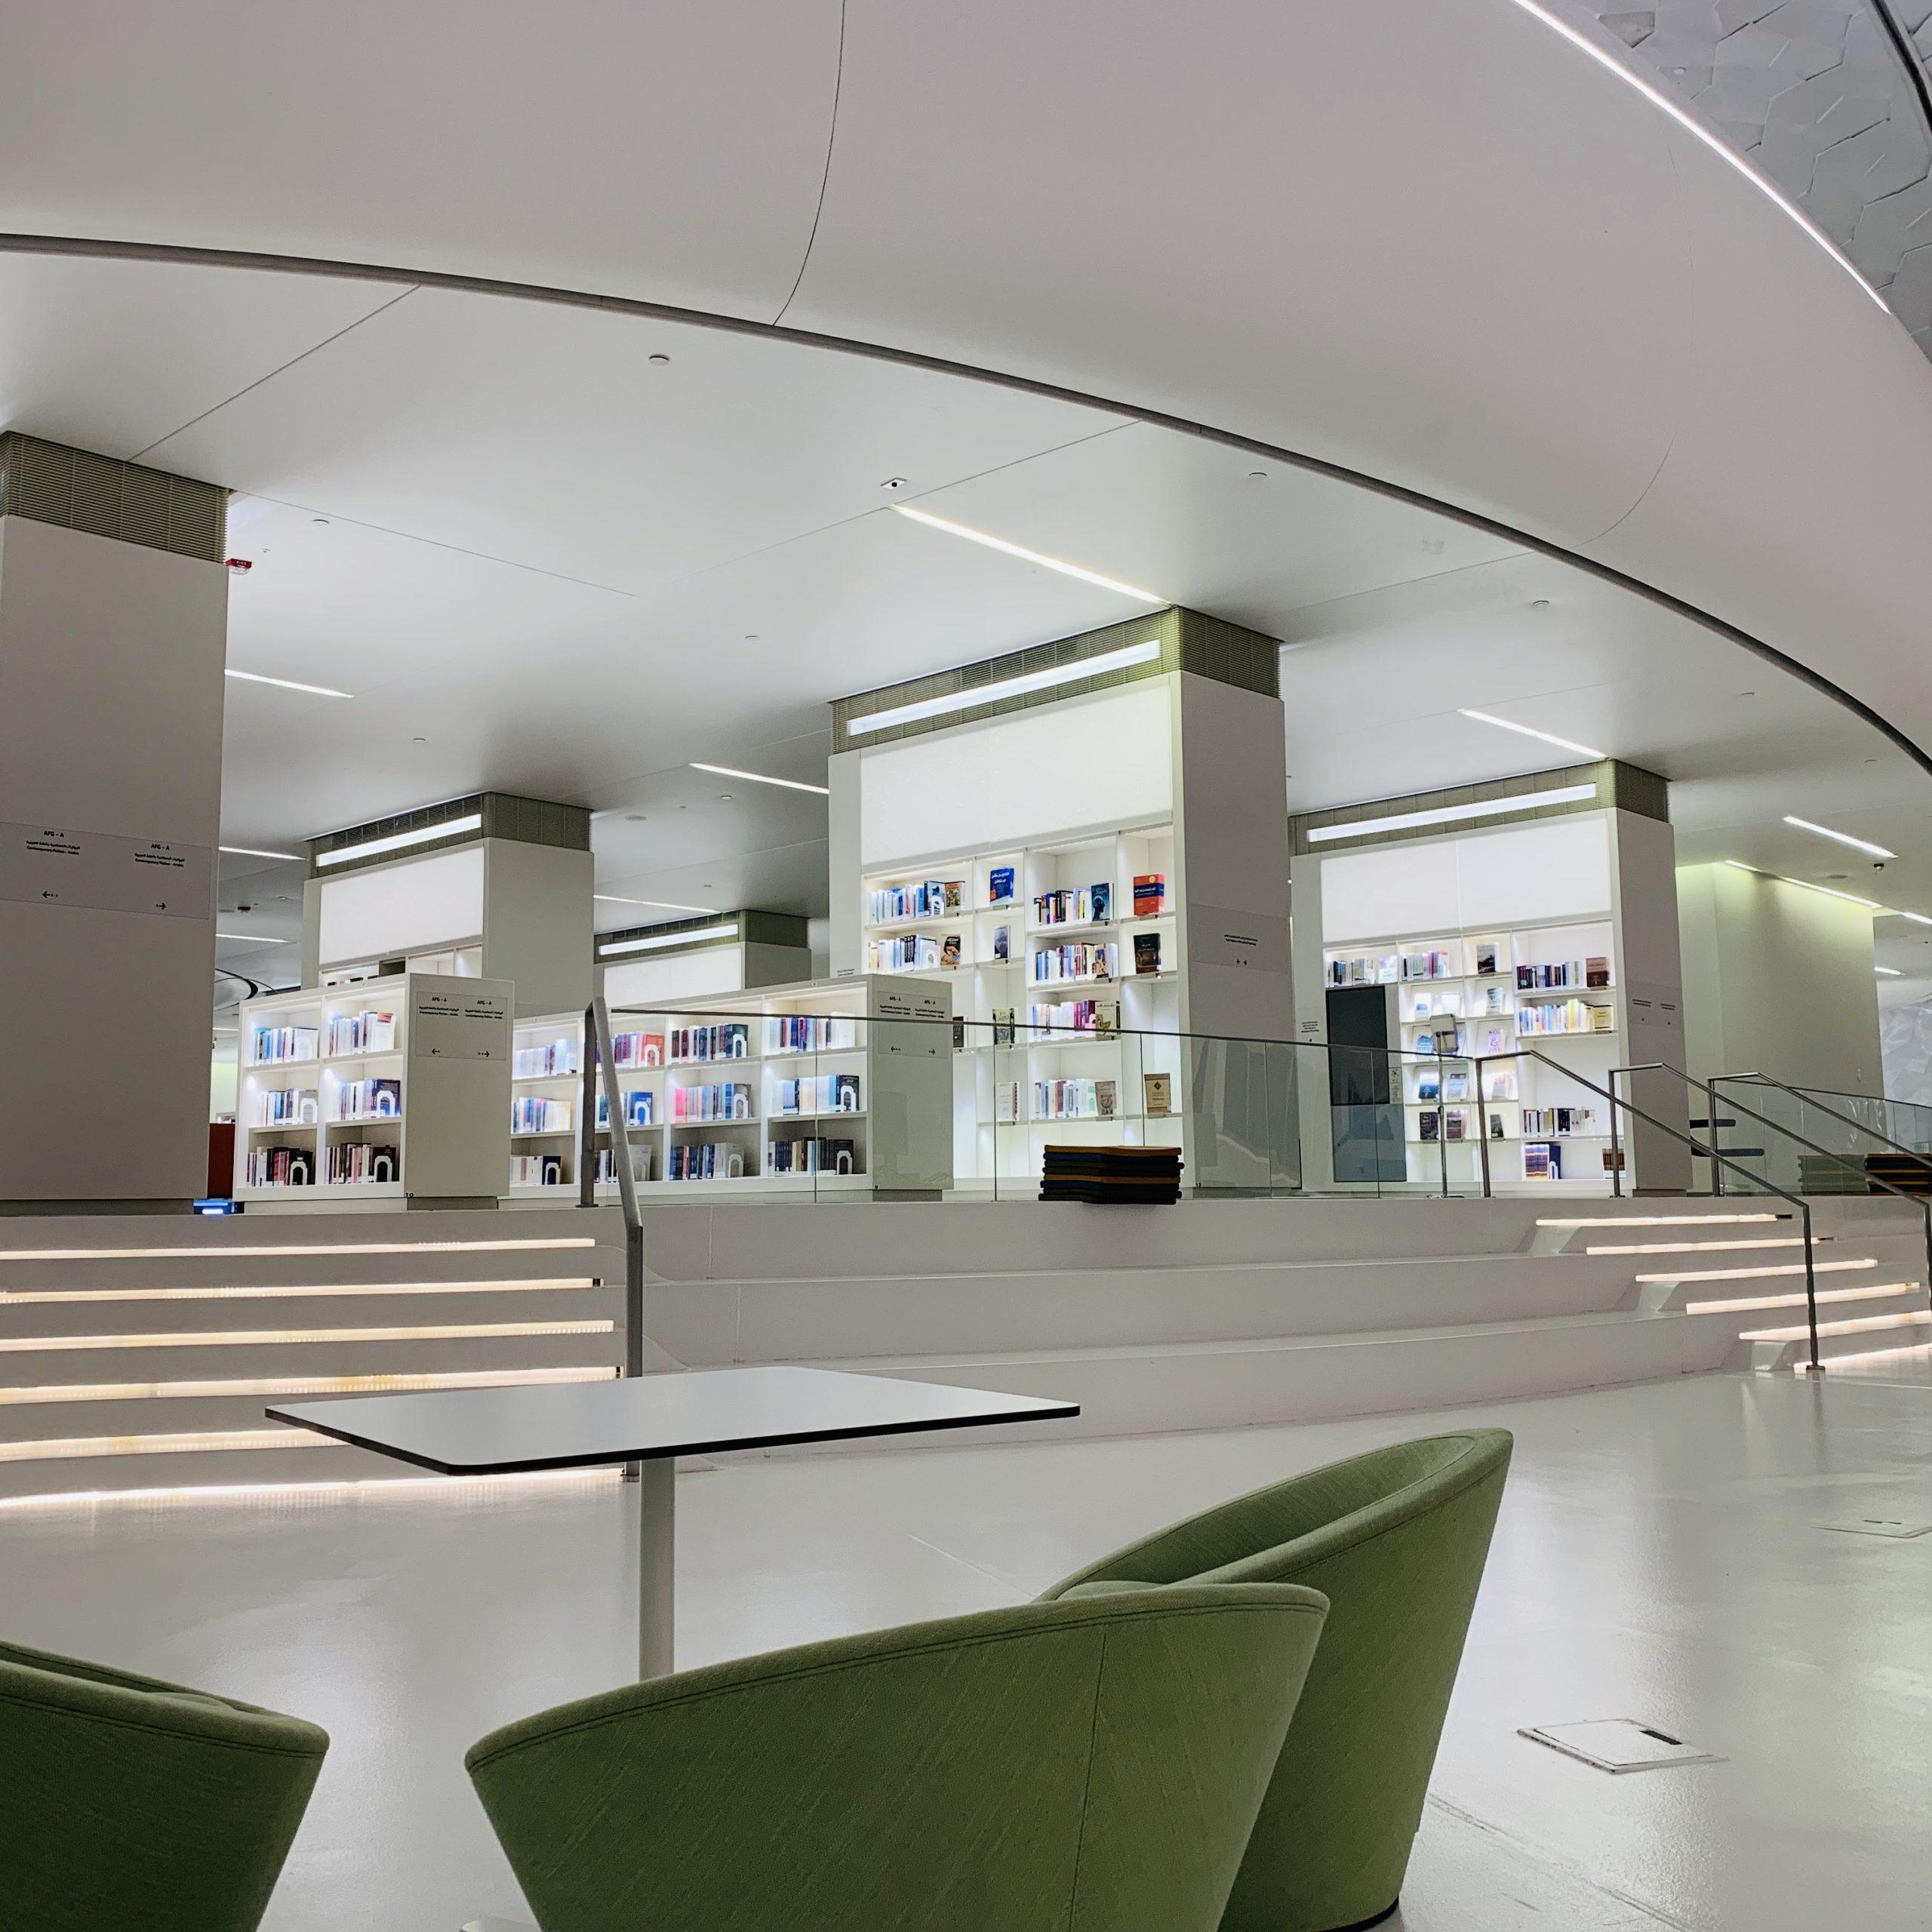 King Abdulaziz Center for World Culture – Dhahran, KSA